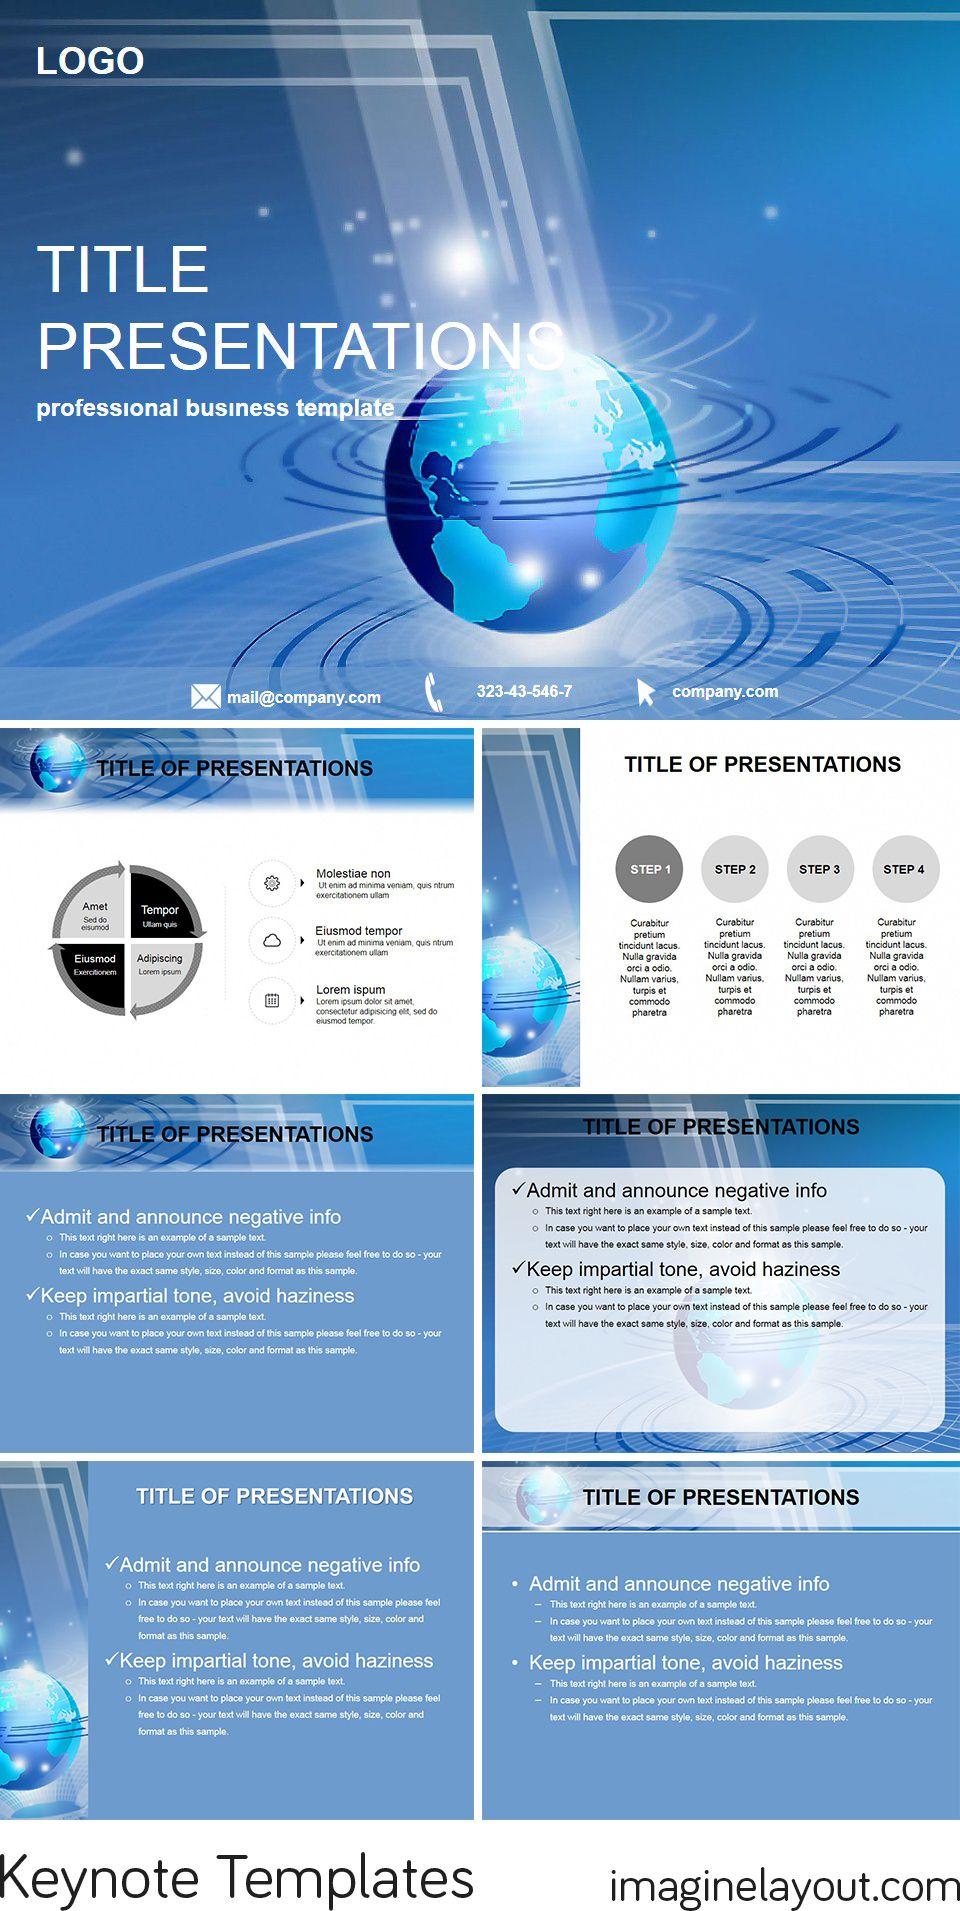 Download World Energy Keynote Templates | Keynote Templates | Pinterest